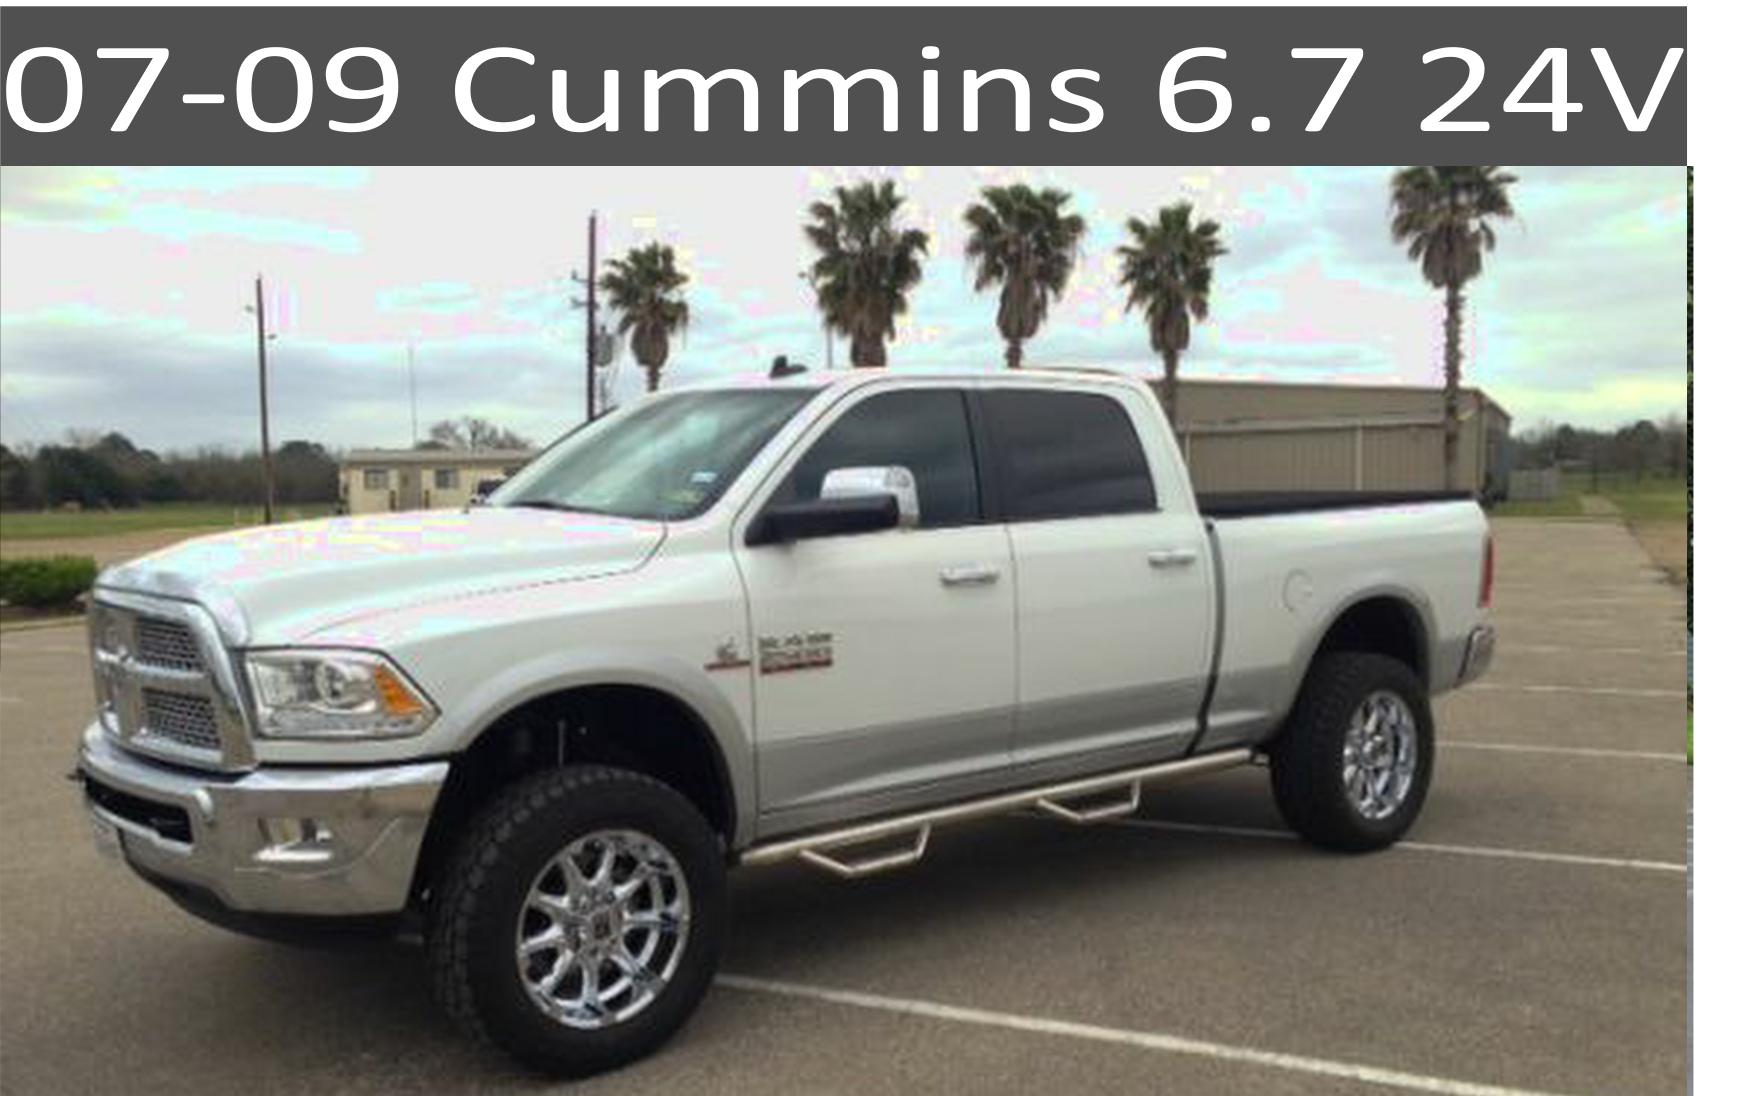 07-09 Dodge Cummins 6.7 Parts